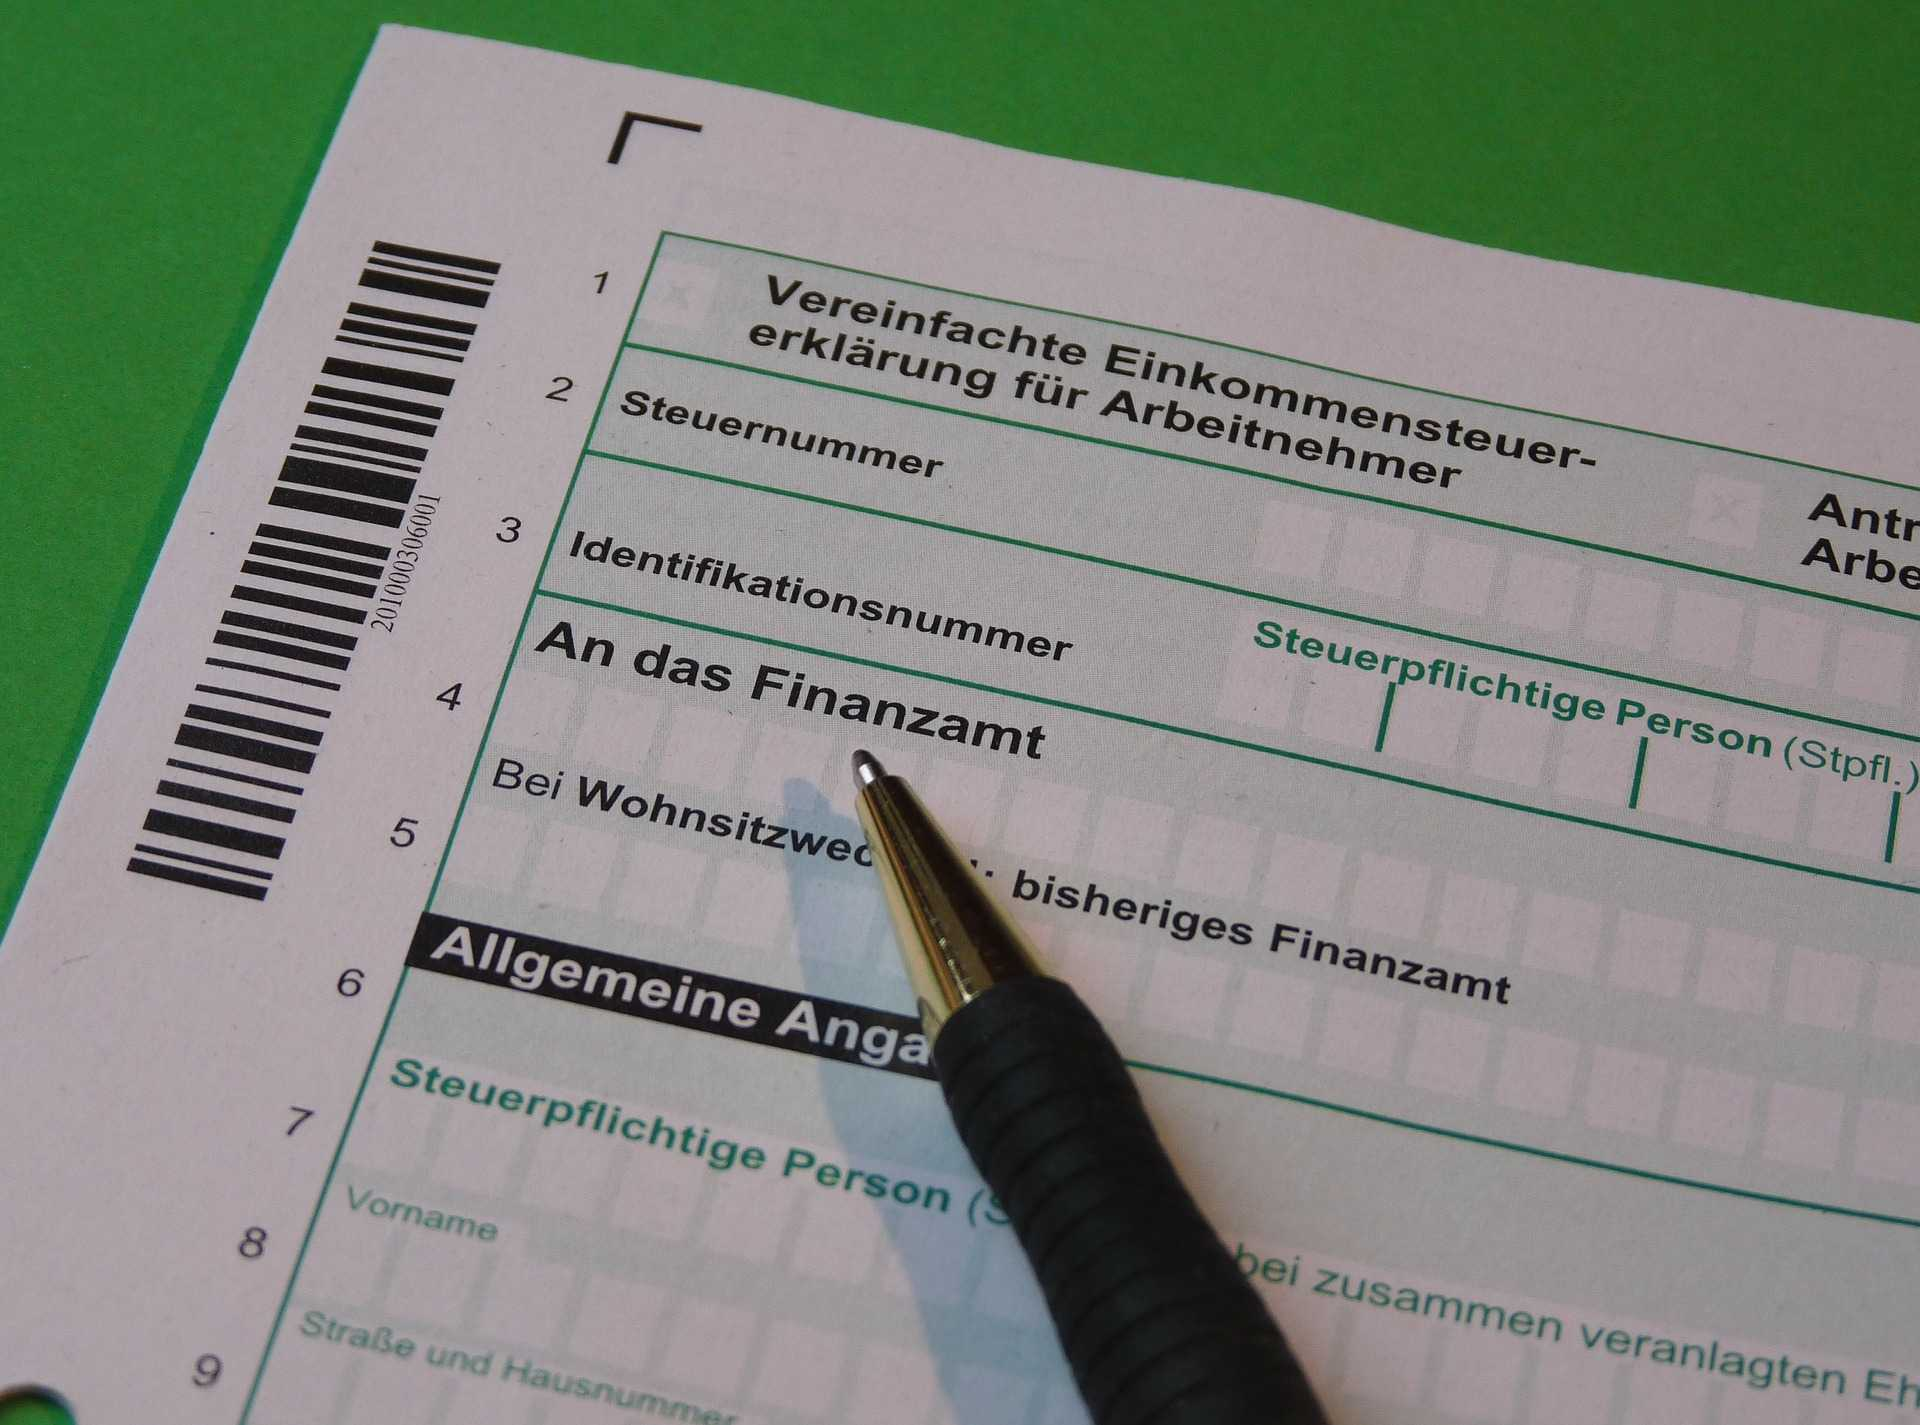 steuer abgabefrist verlängert - Elektroschrott - ab 1. Mai 2019 zum Wertstoffhof